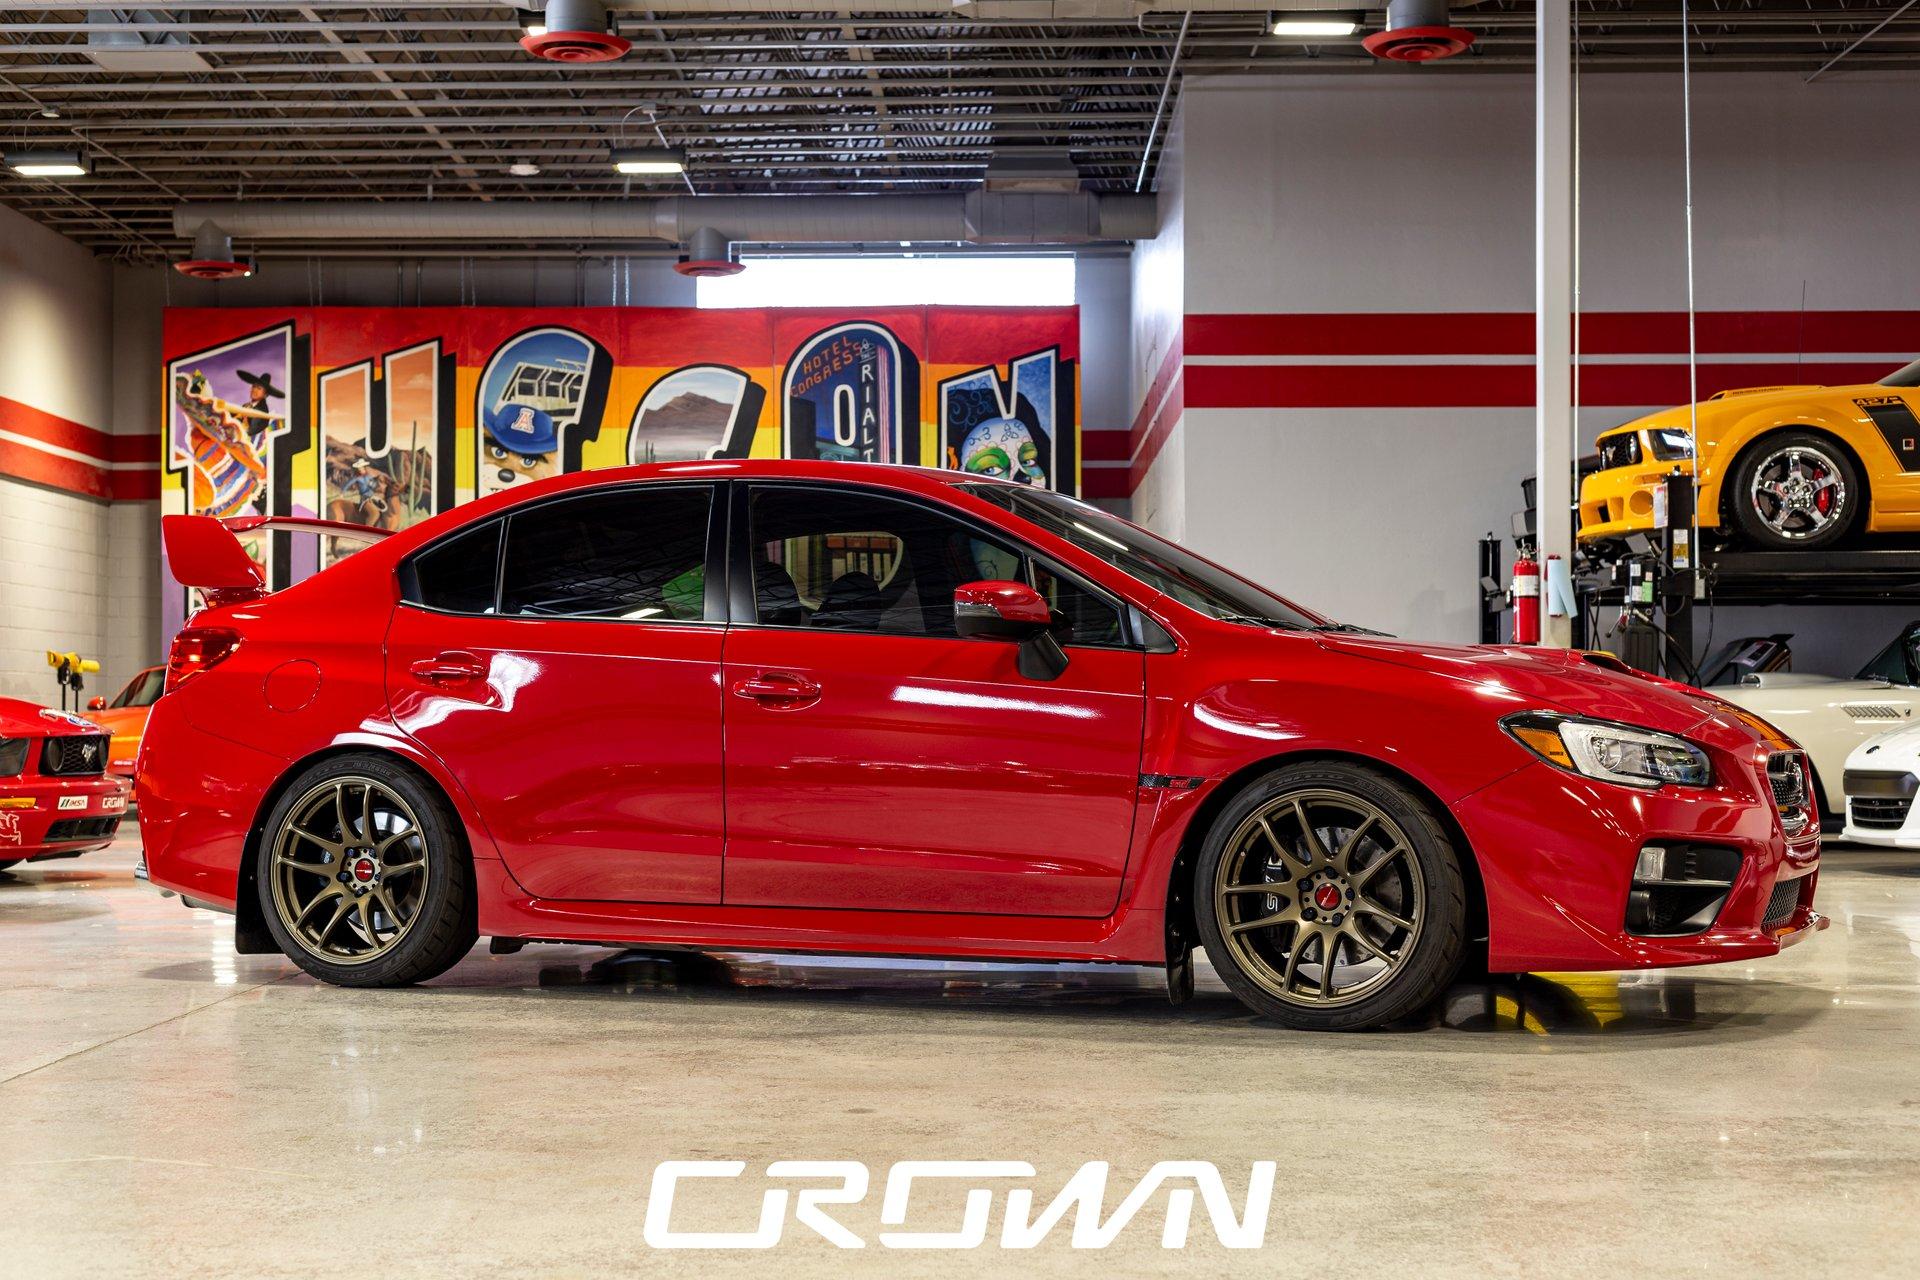 2015 Sti For Sale >> 2015 Subaru Sti For Sale 169929 Motorious